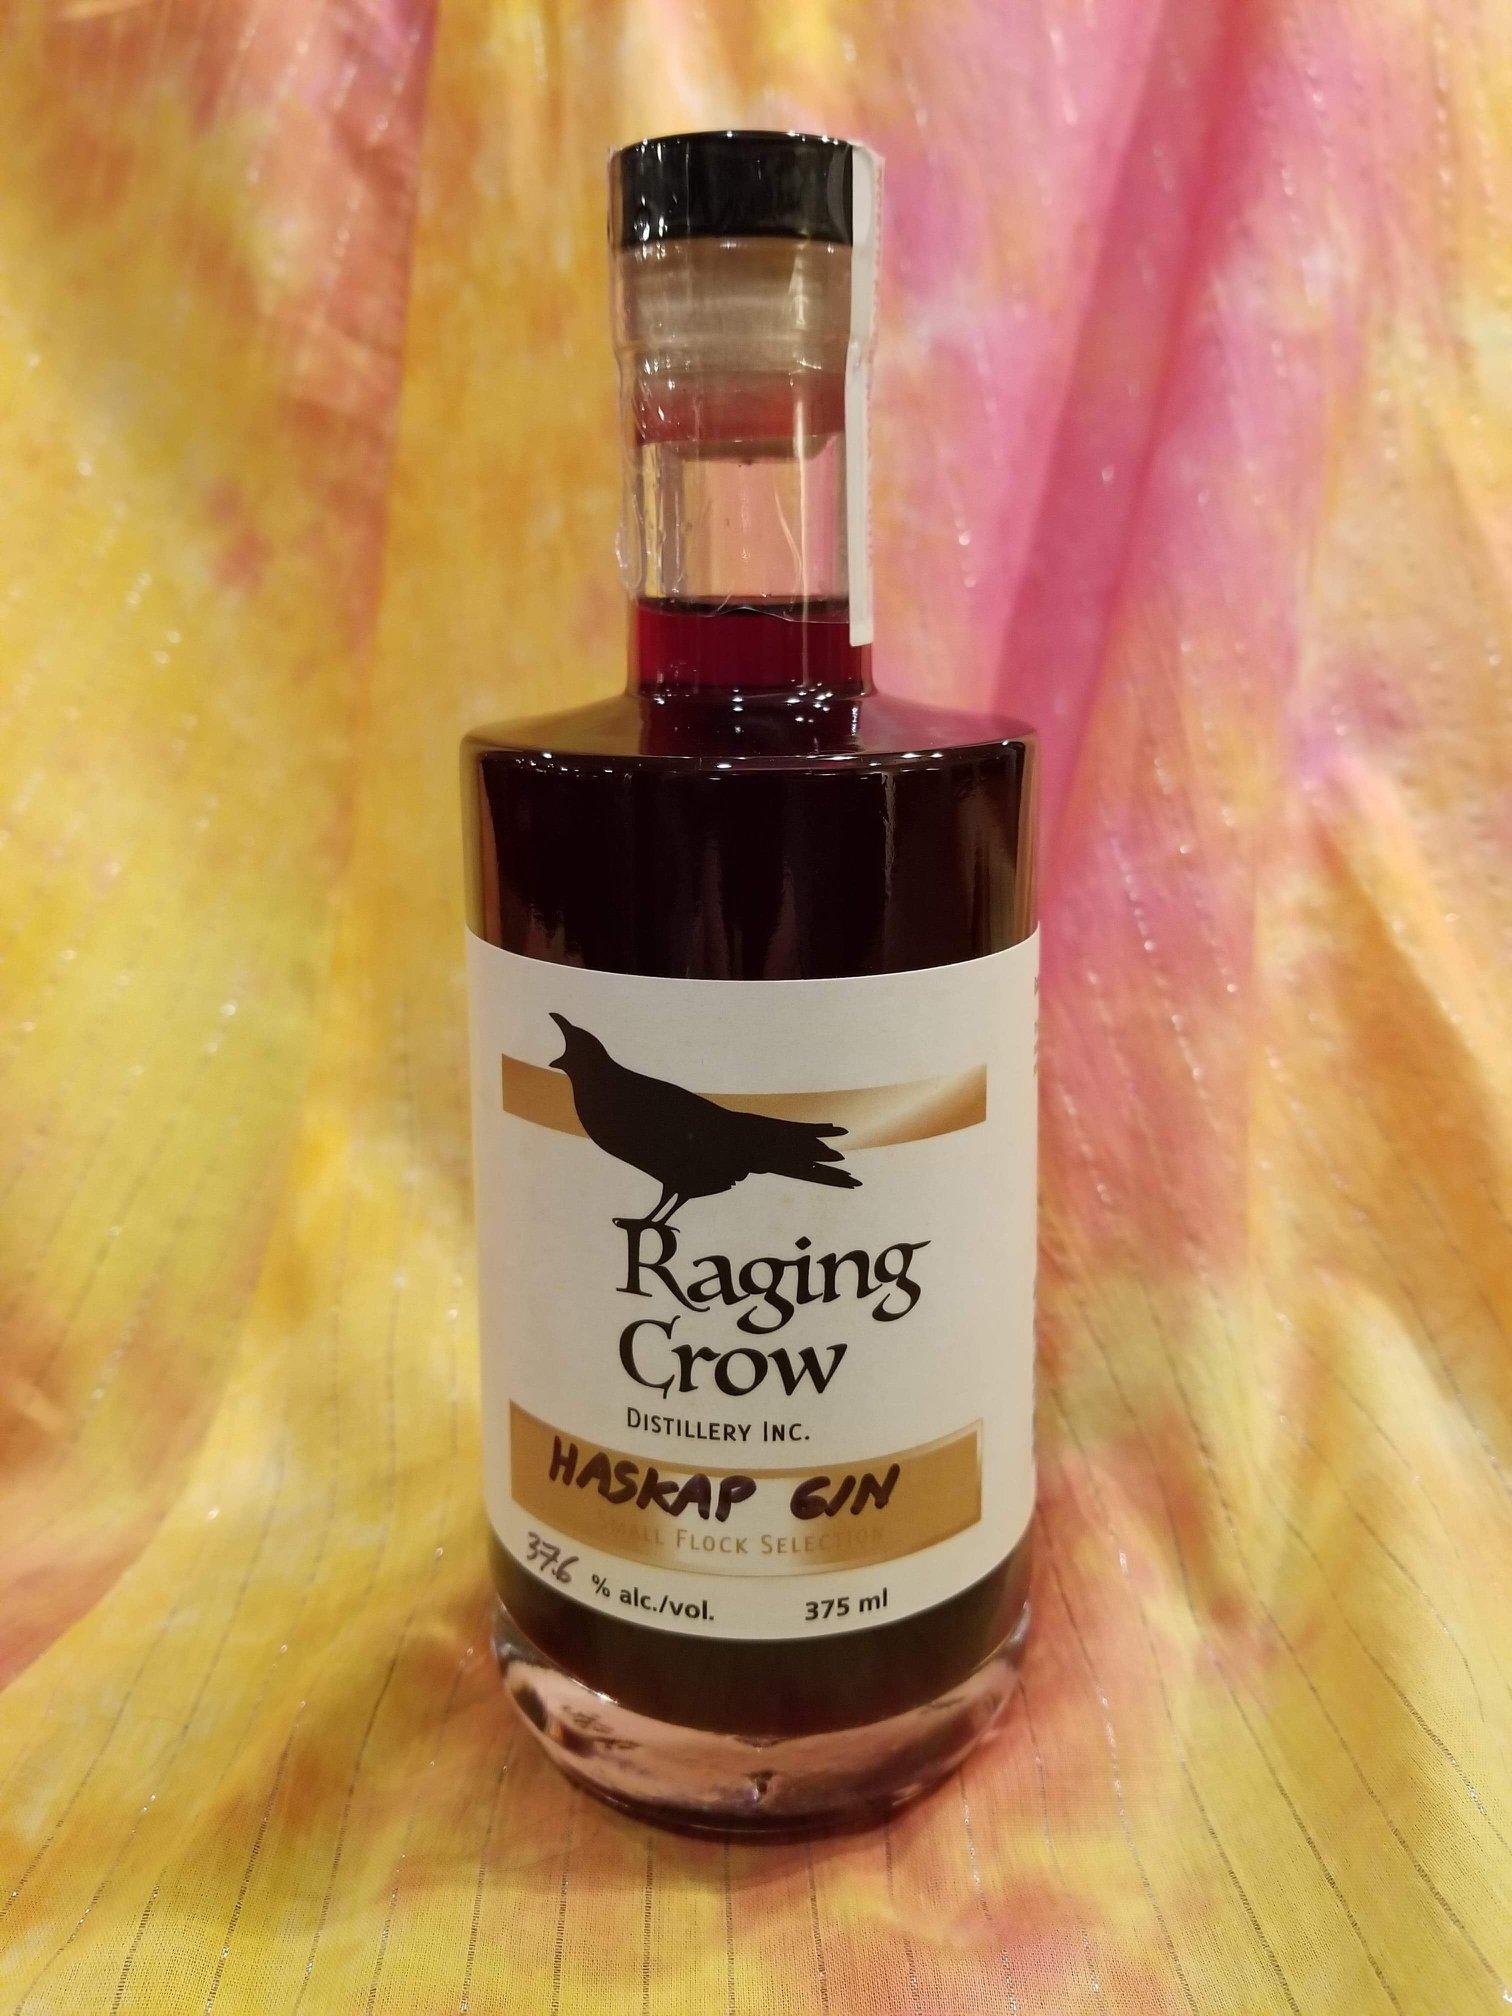 Haskap Martini - 1.5 ozs of Raging Crow Haskap GinSplash of VermouthZest of Lemon